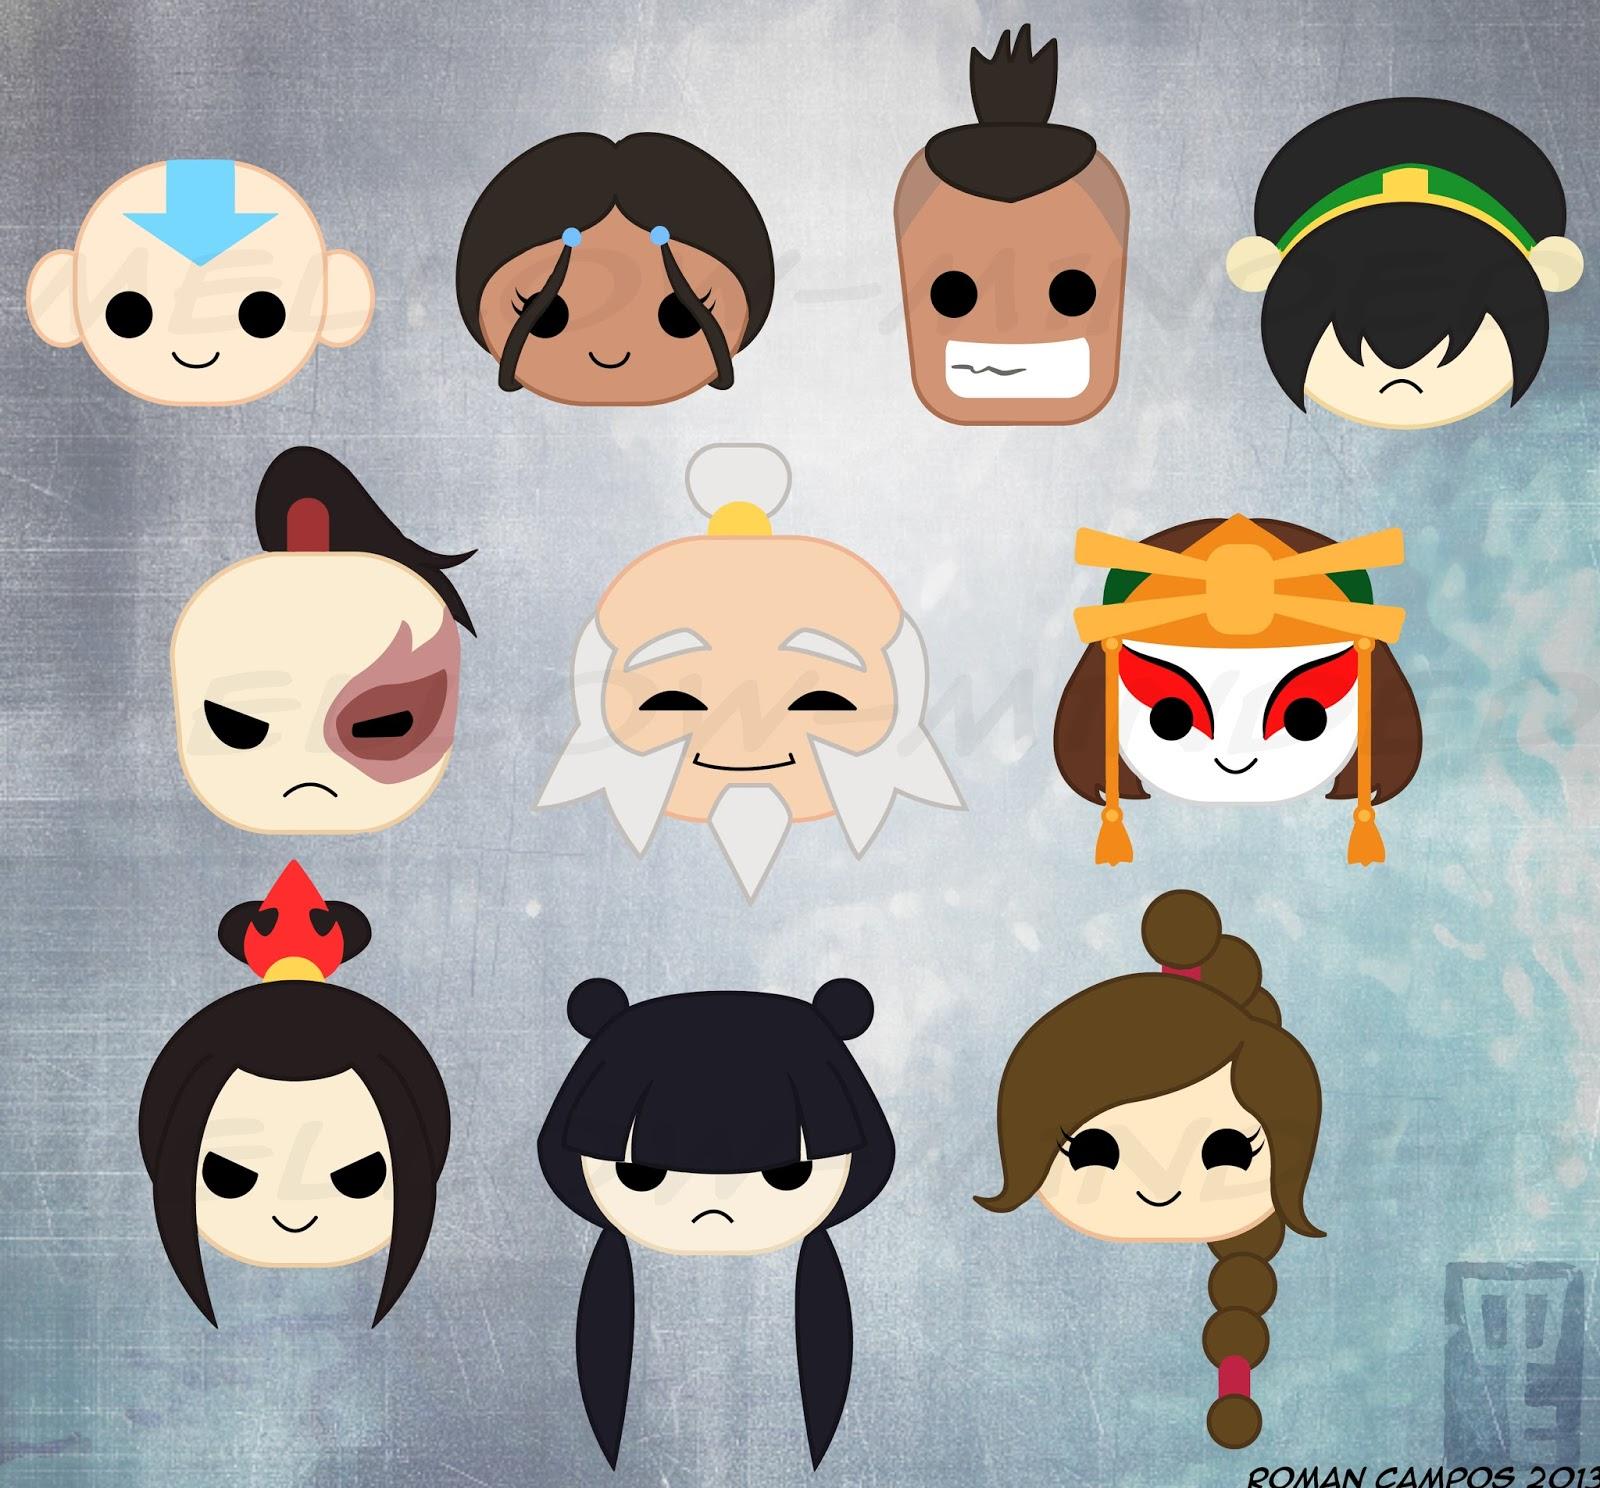 Avatar 2 Cast: Roman Campos Artwork: August 2013